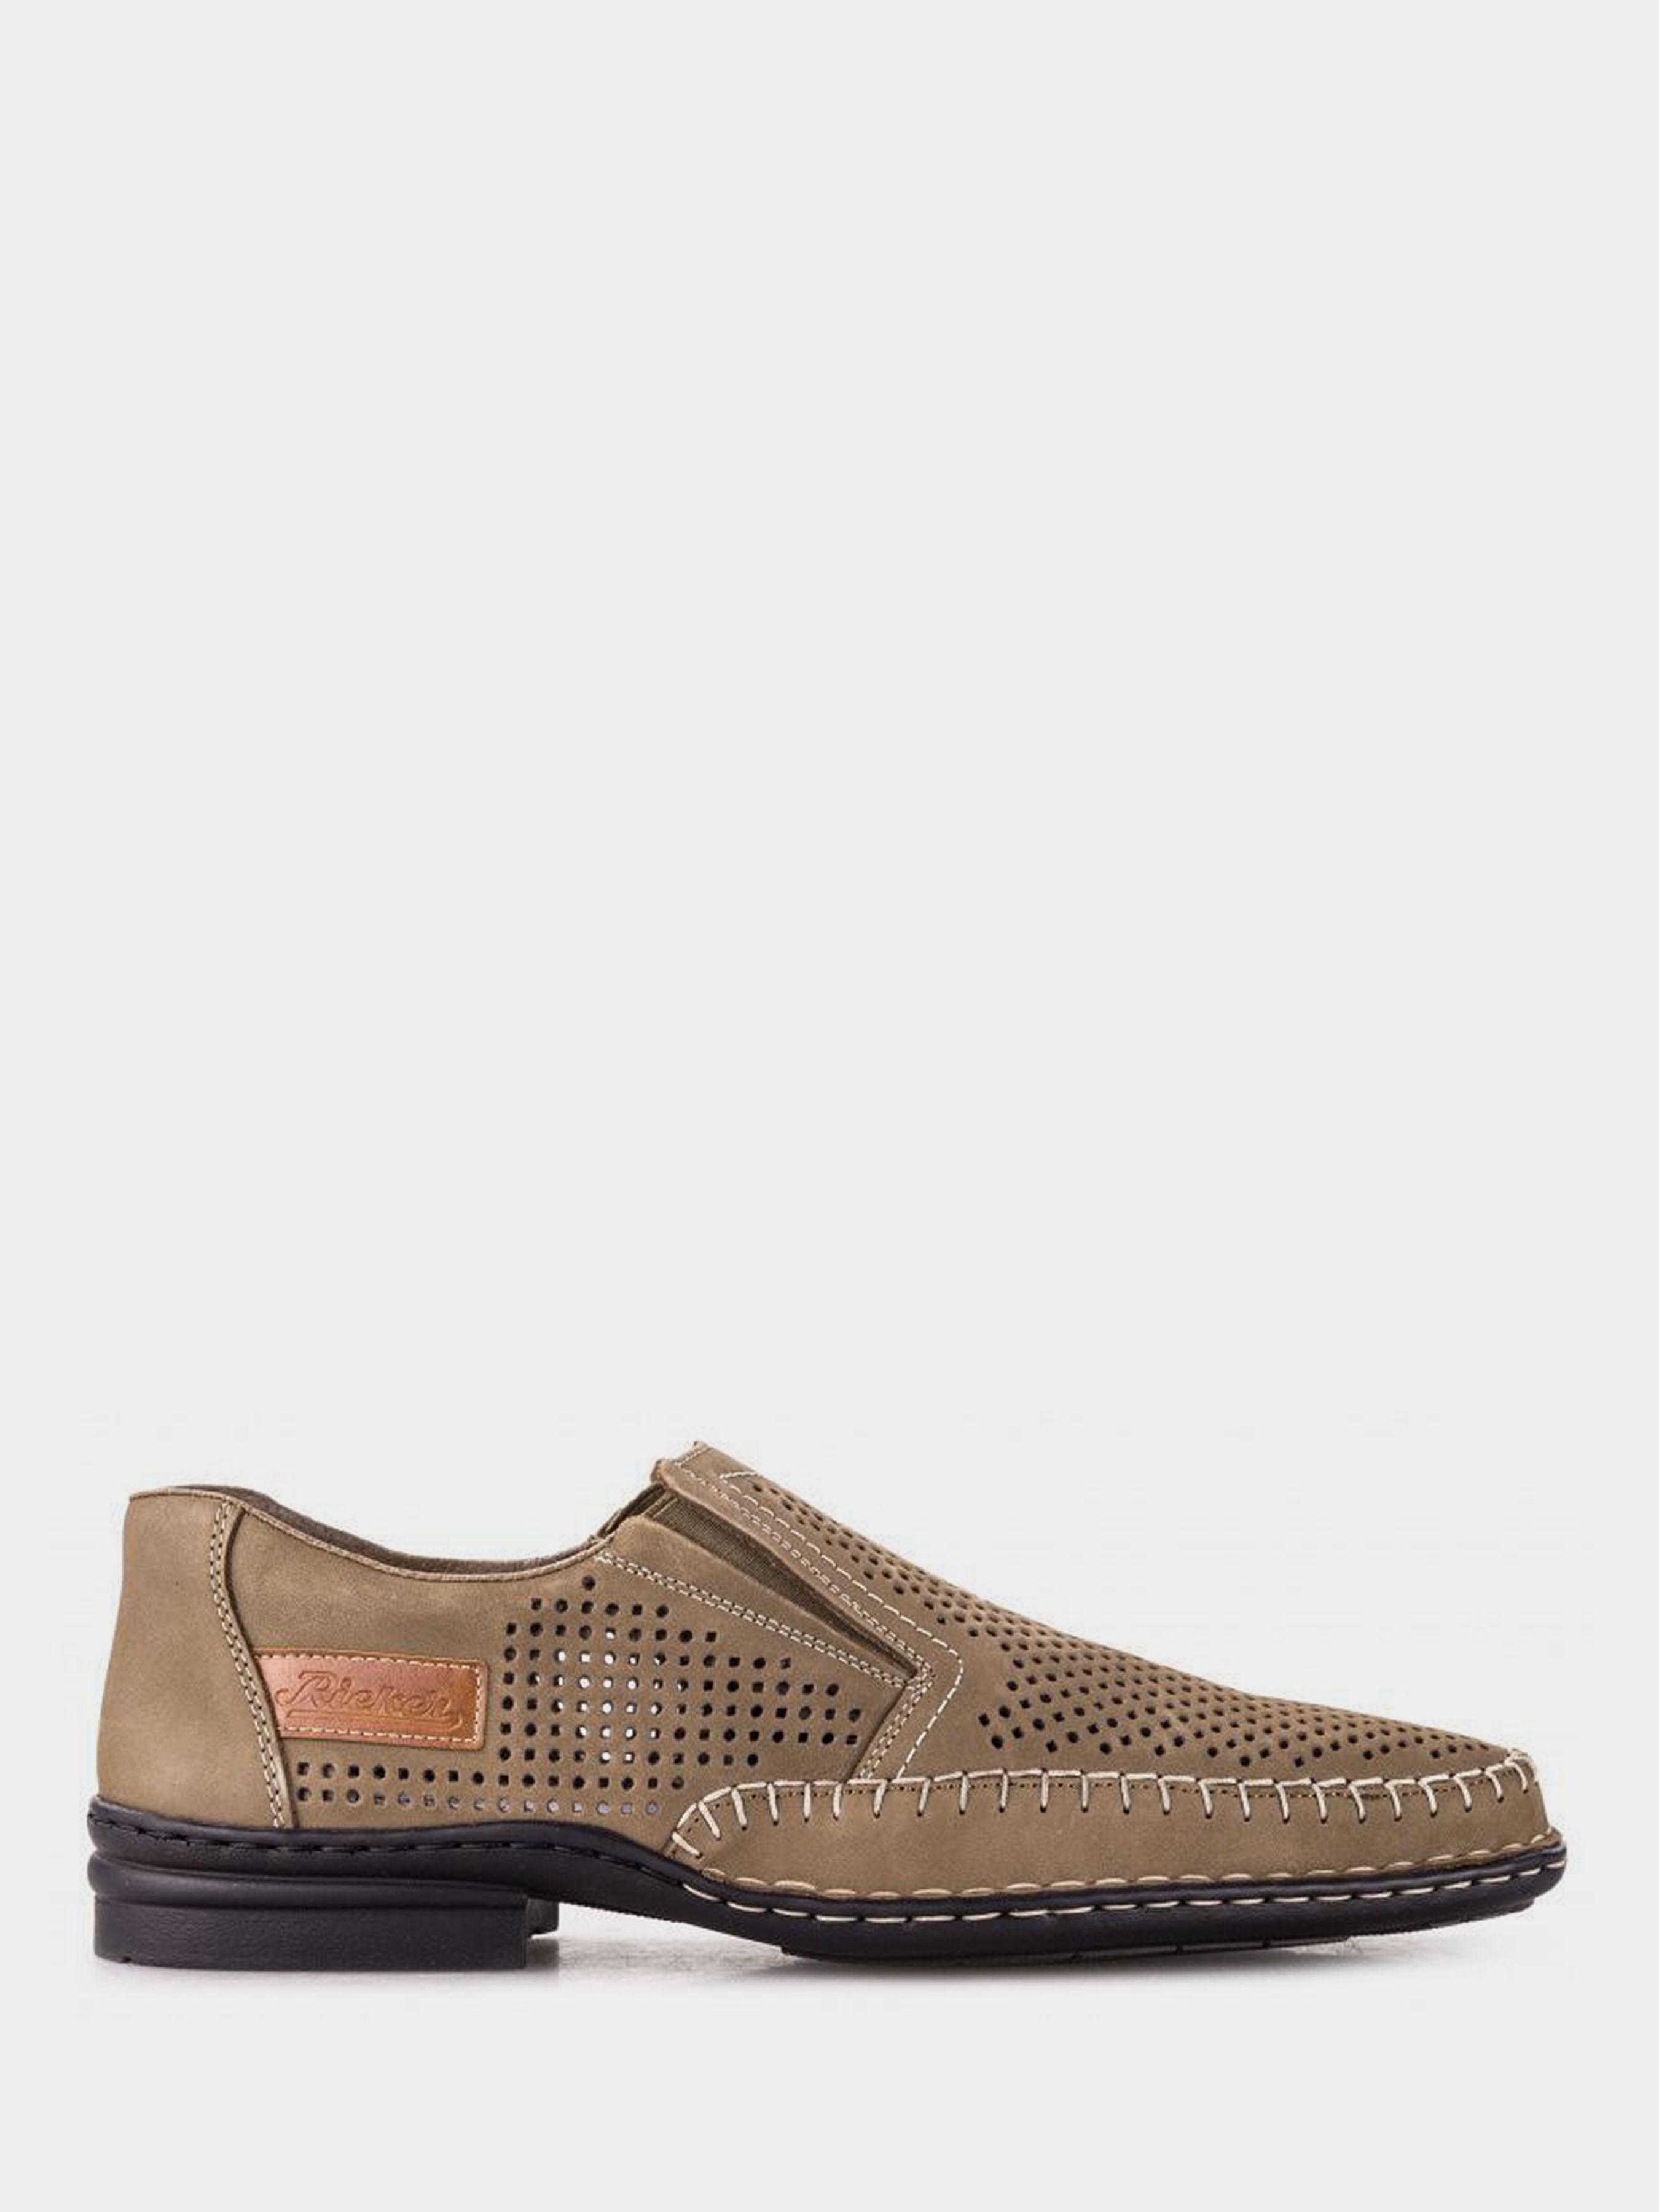 Полуботинки для мужчин RIEKER RK672 размеры обуви, 2017